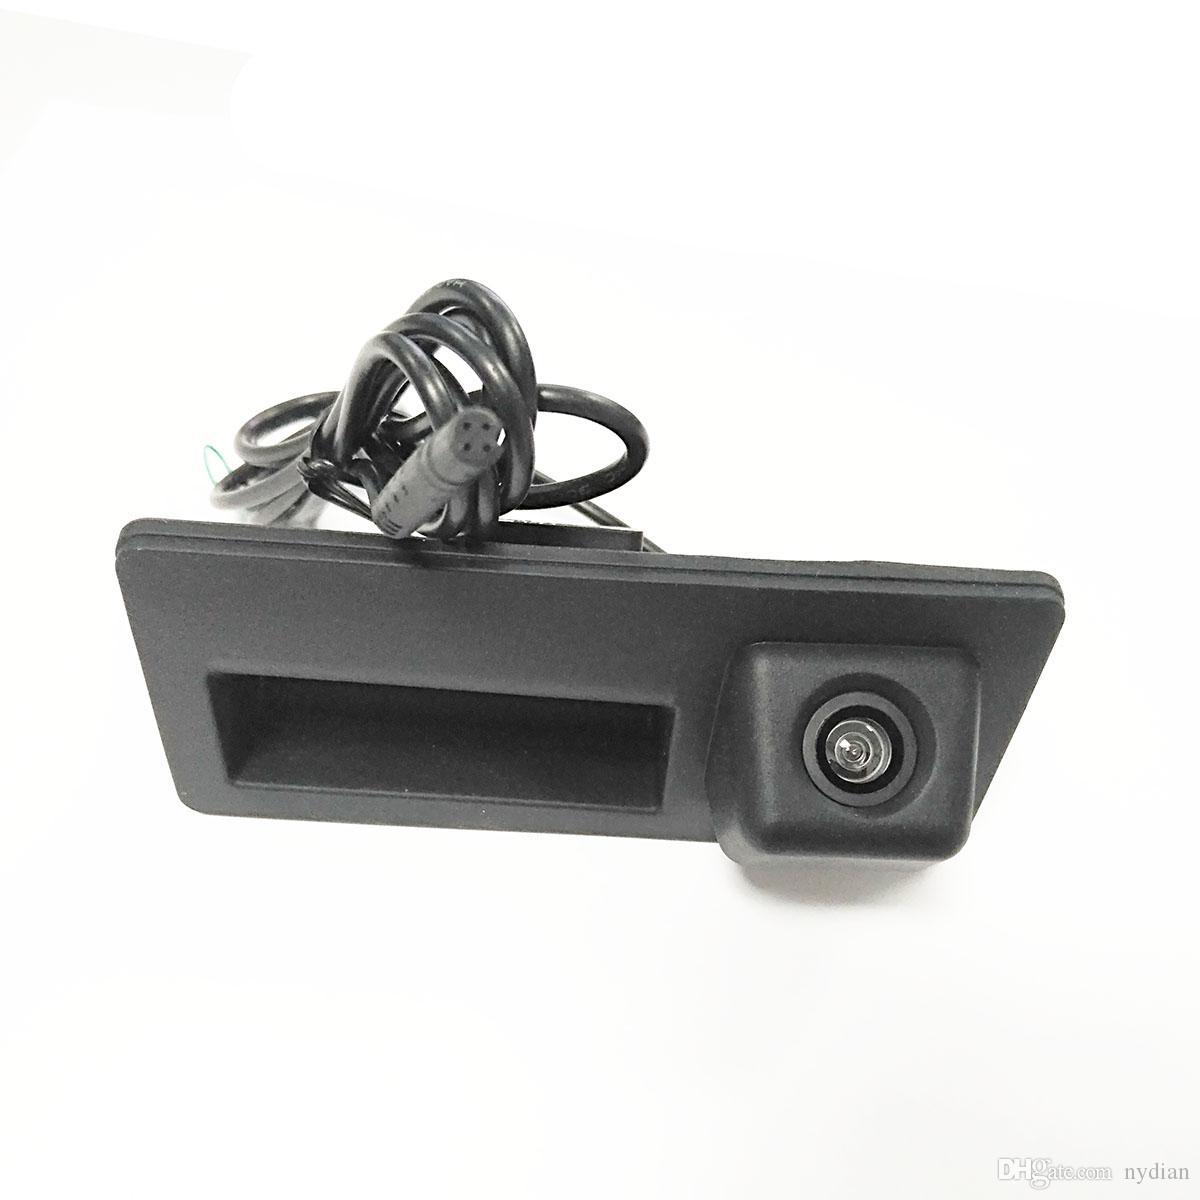 Auto-hintere Ansicht Heckklappengriff Kamera für Audi A4 Q5 A4